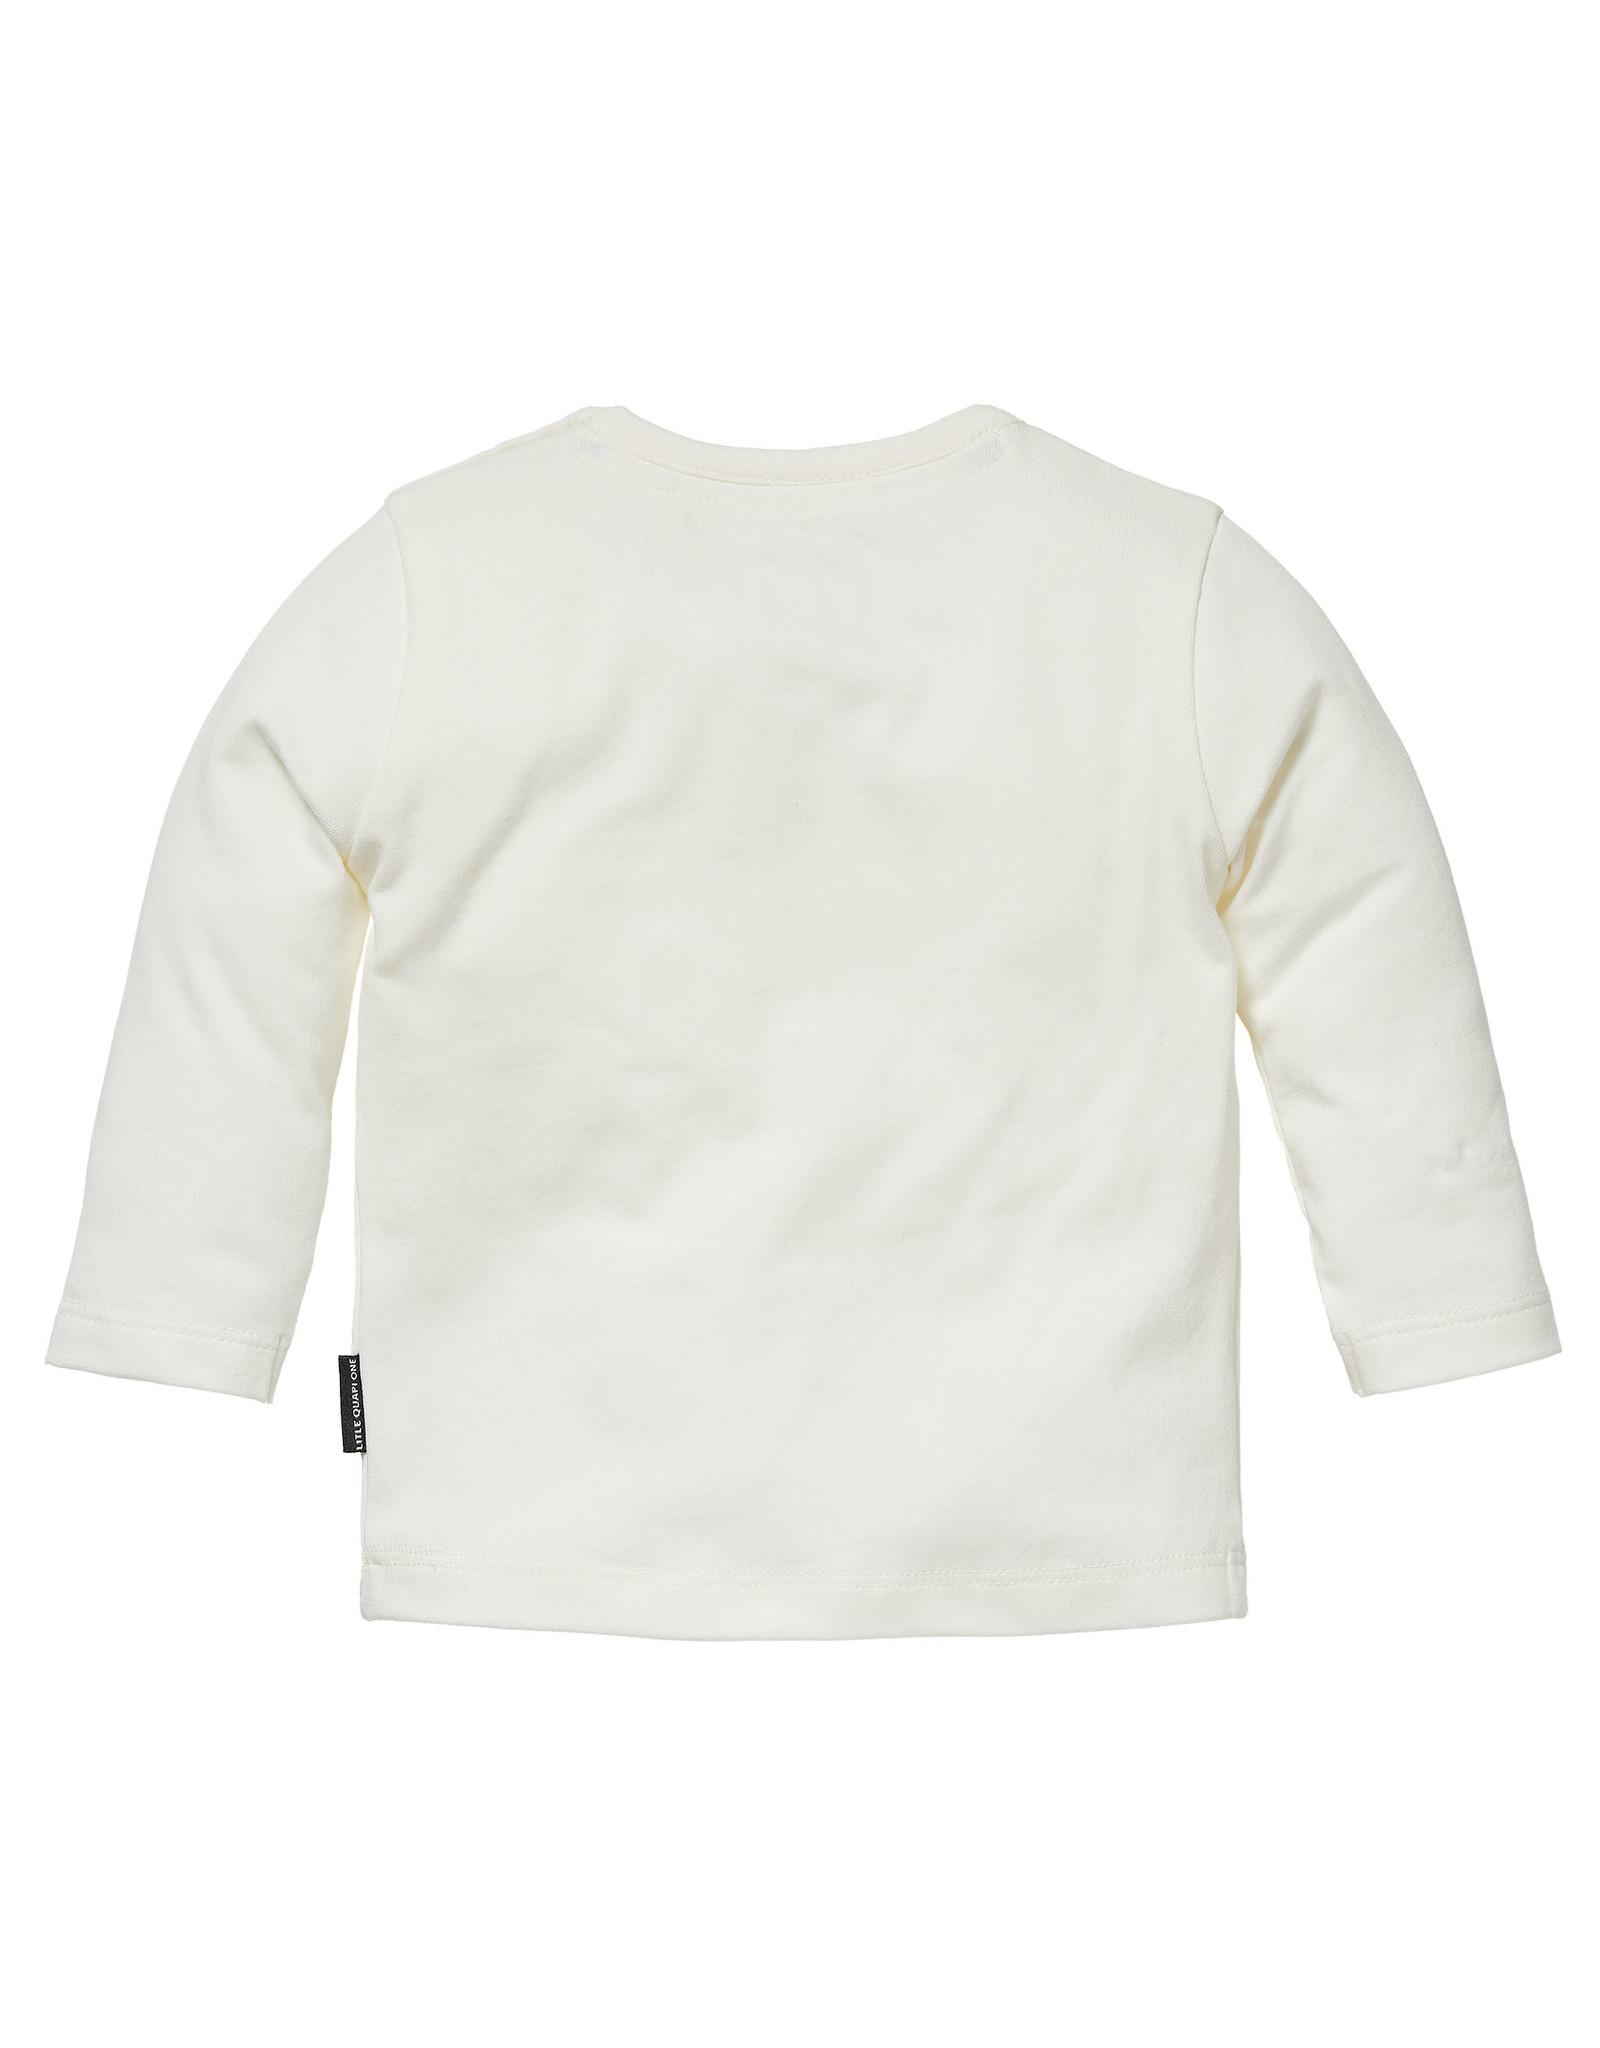 Quapi Quapi newborn baby neutraal shirt Zee